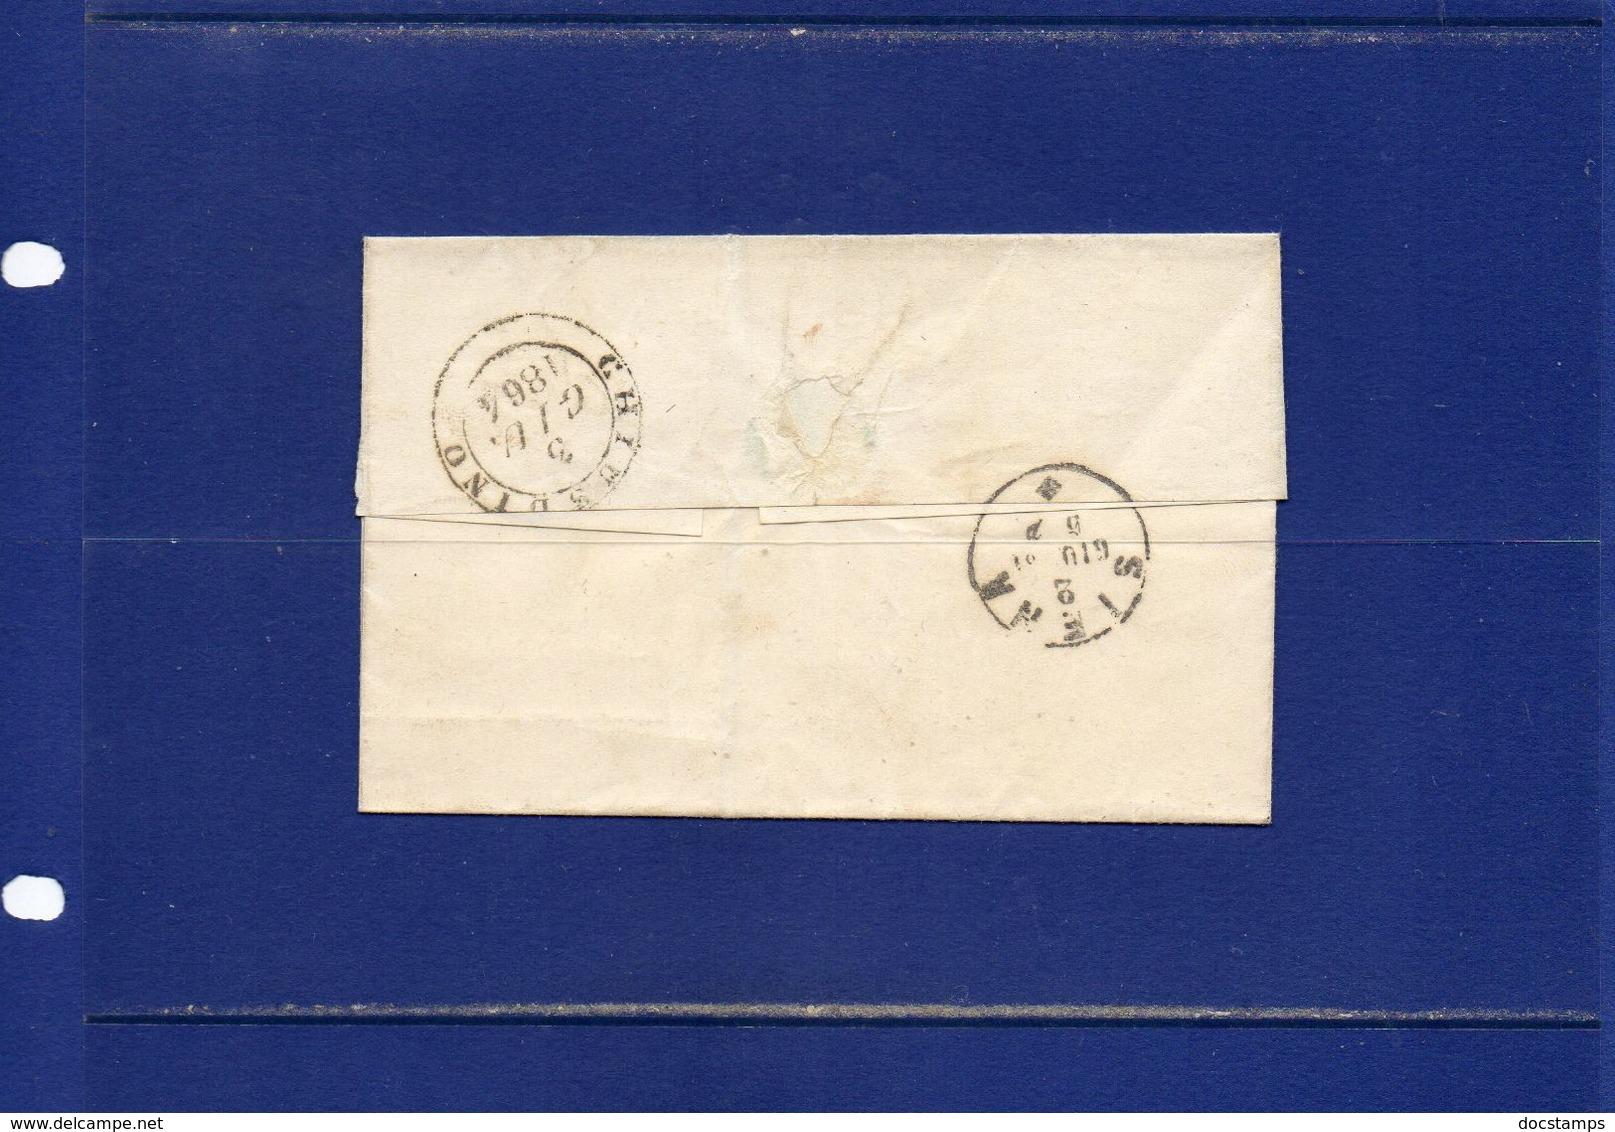 ##(ANT182)- 2-6-1864- Sinalunga(Siena)-  Cent 15  Su  Piego Privo Di Testo  Per  Chiusdino (Siena) - 1861-78 Vittorio Emanuele II